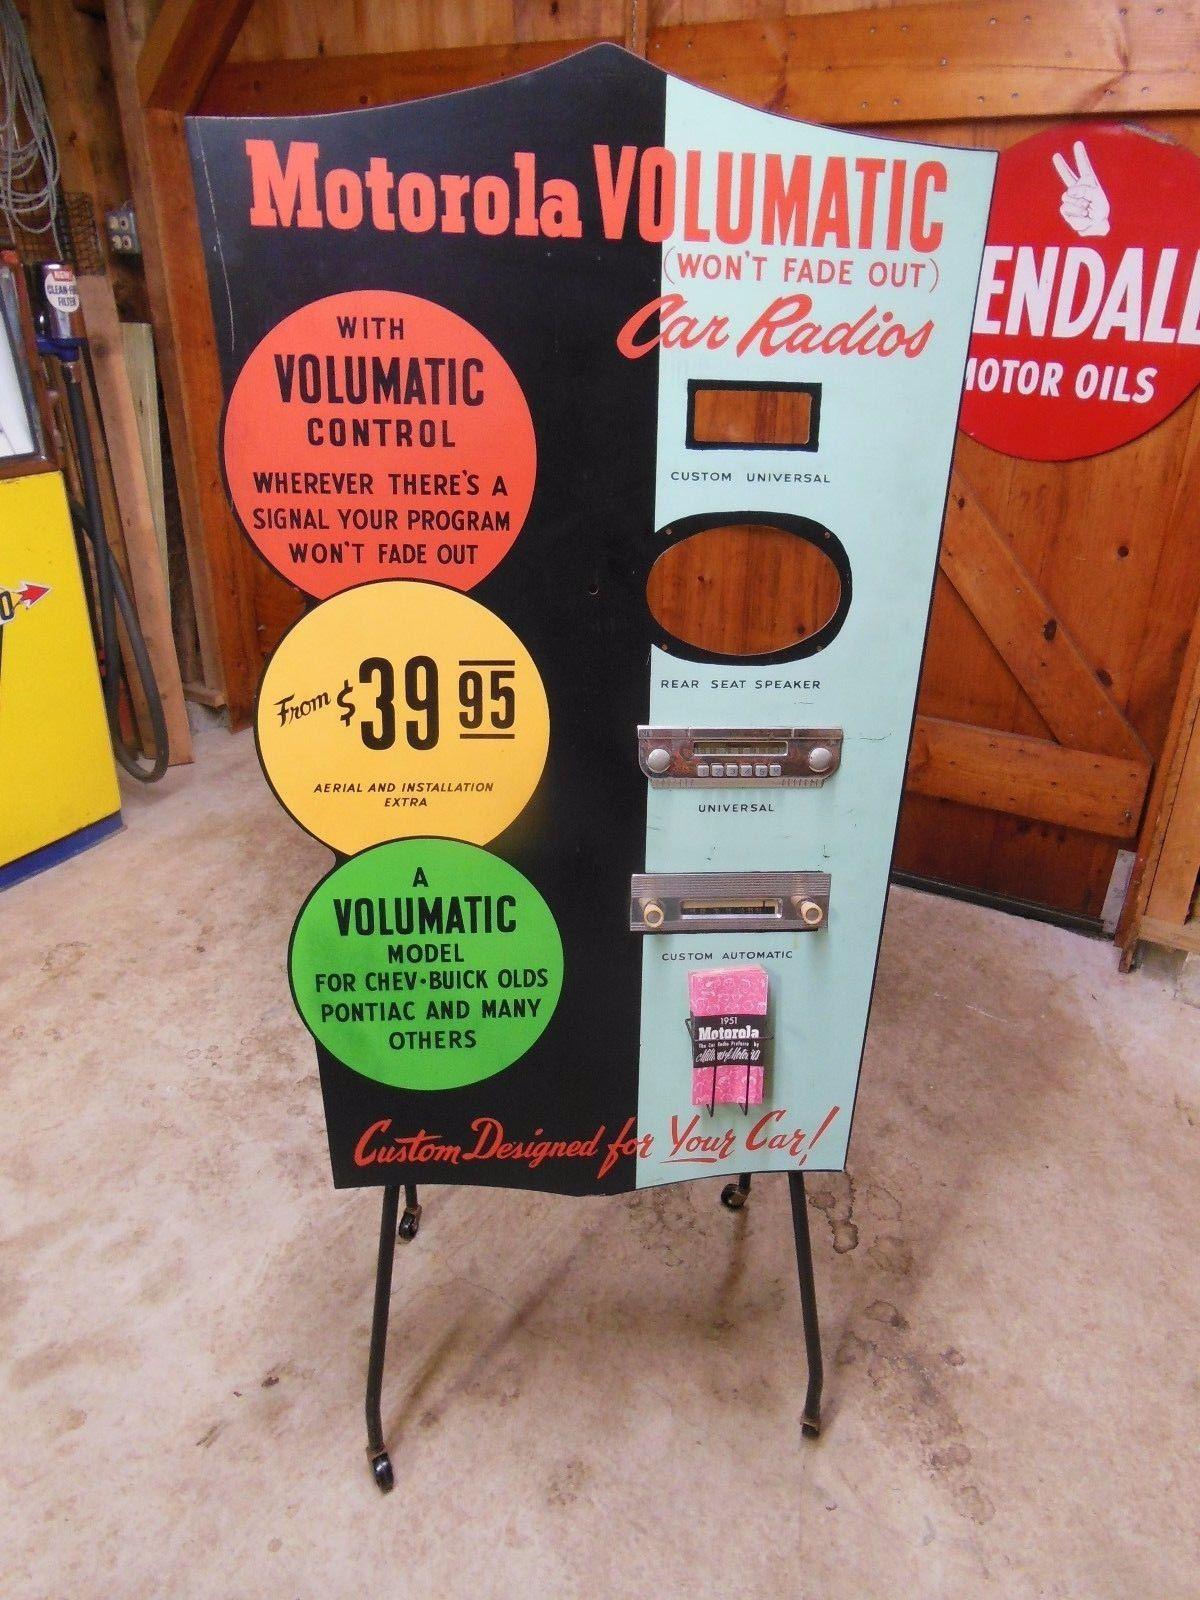 1951 dealer promotion display for the motorola volumatic car radio image ebay